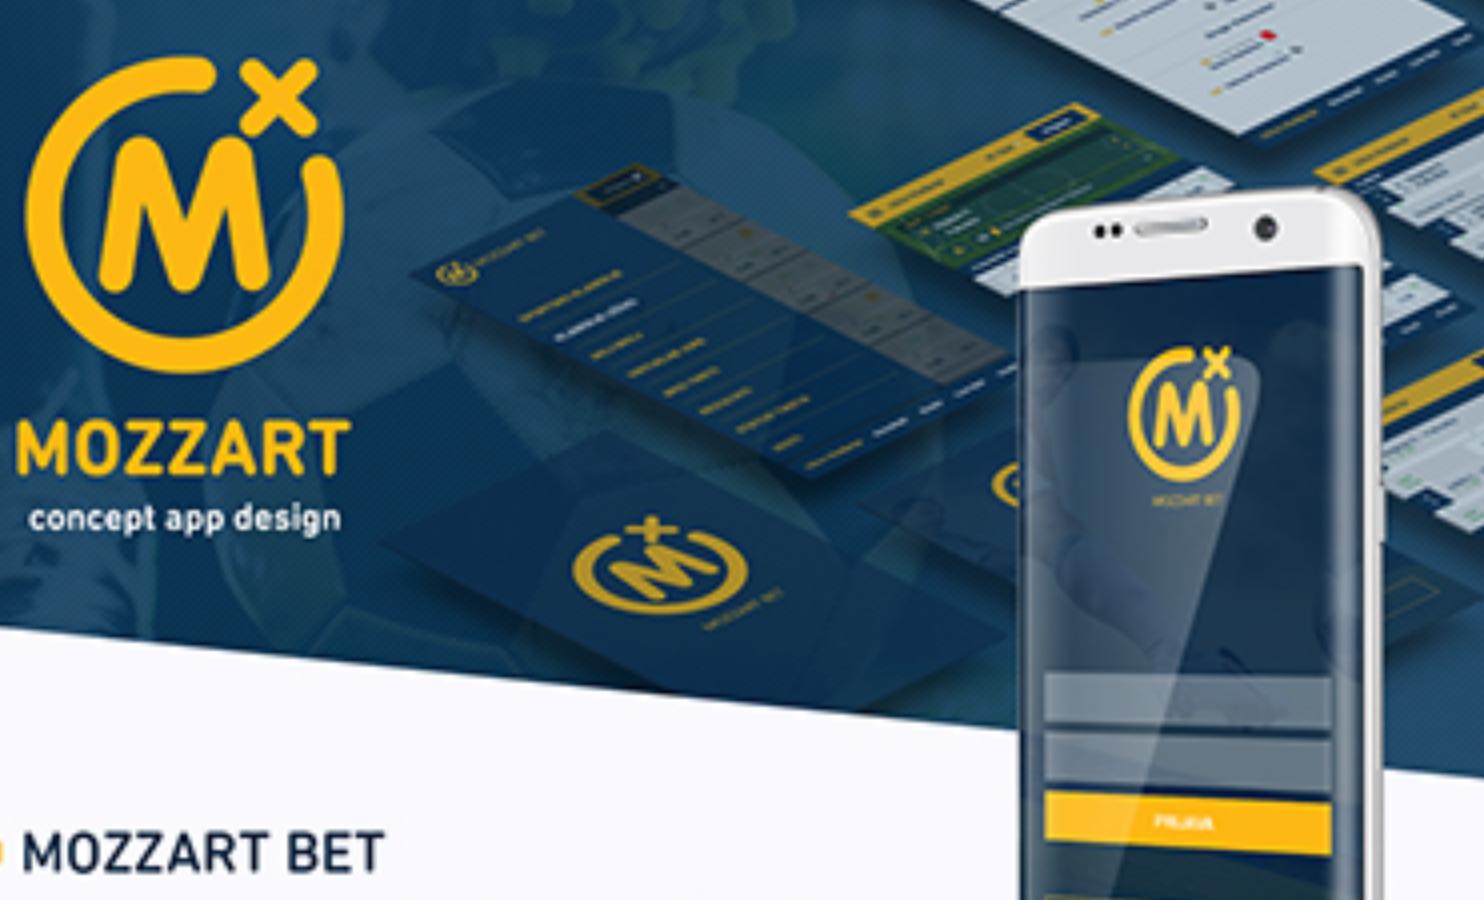 Mozzart bet app functionality